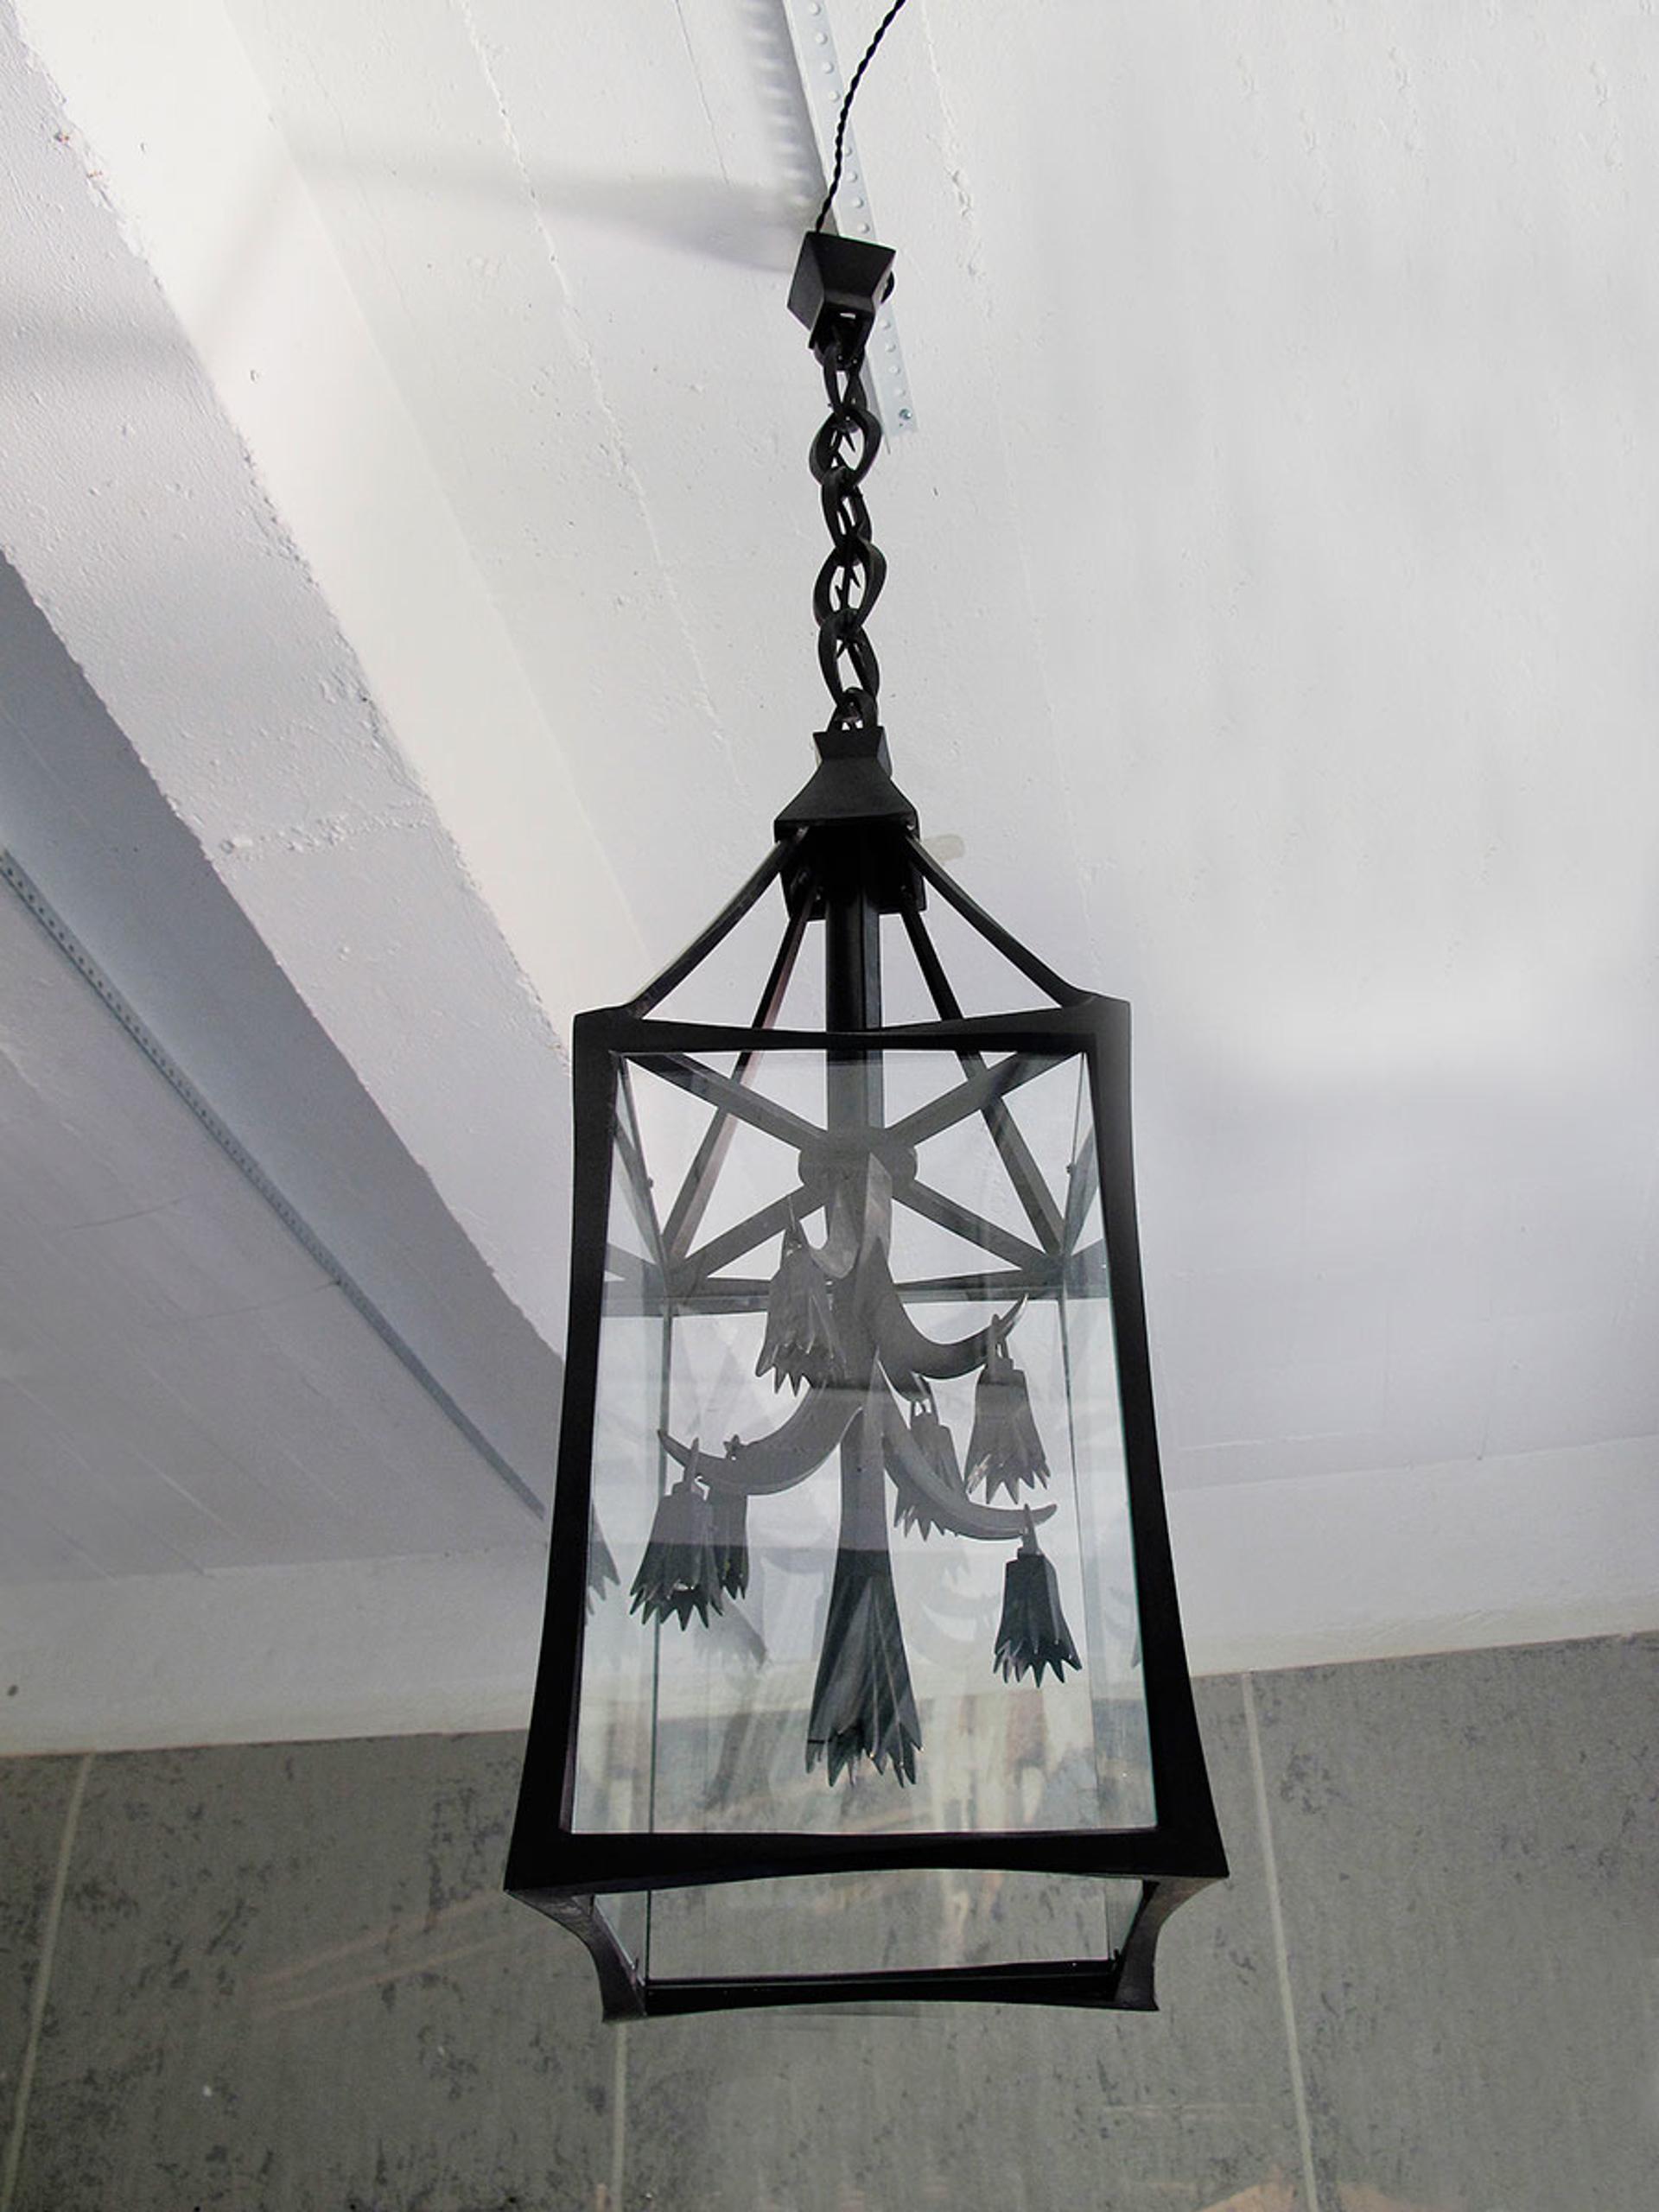 Bronze lantern by Anasthasia Millot